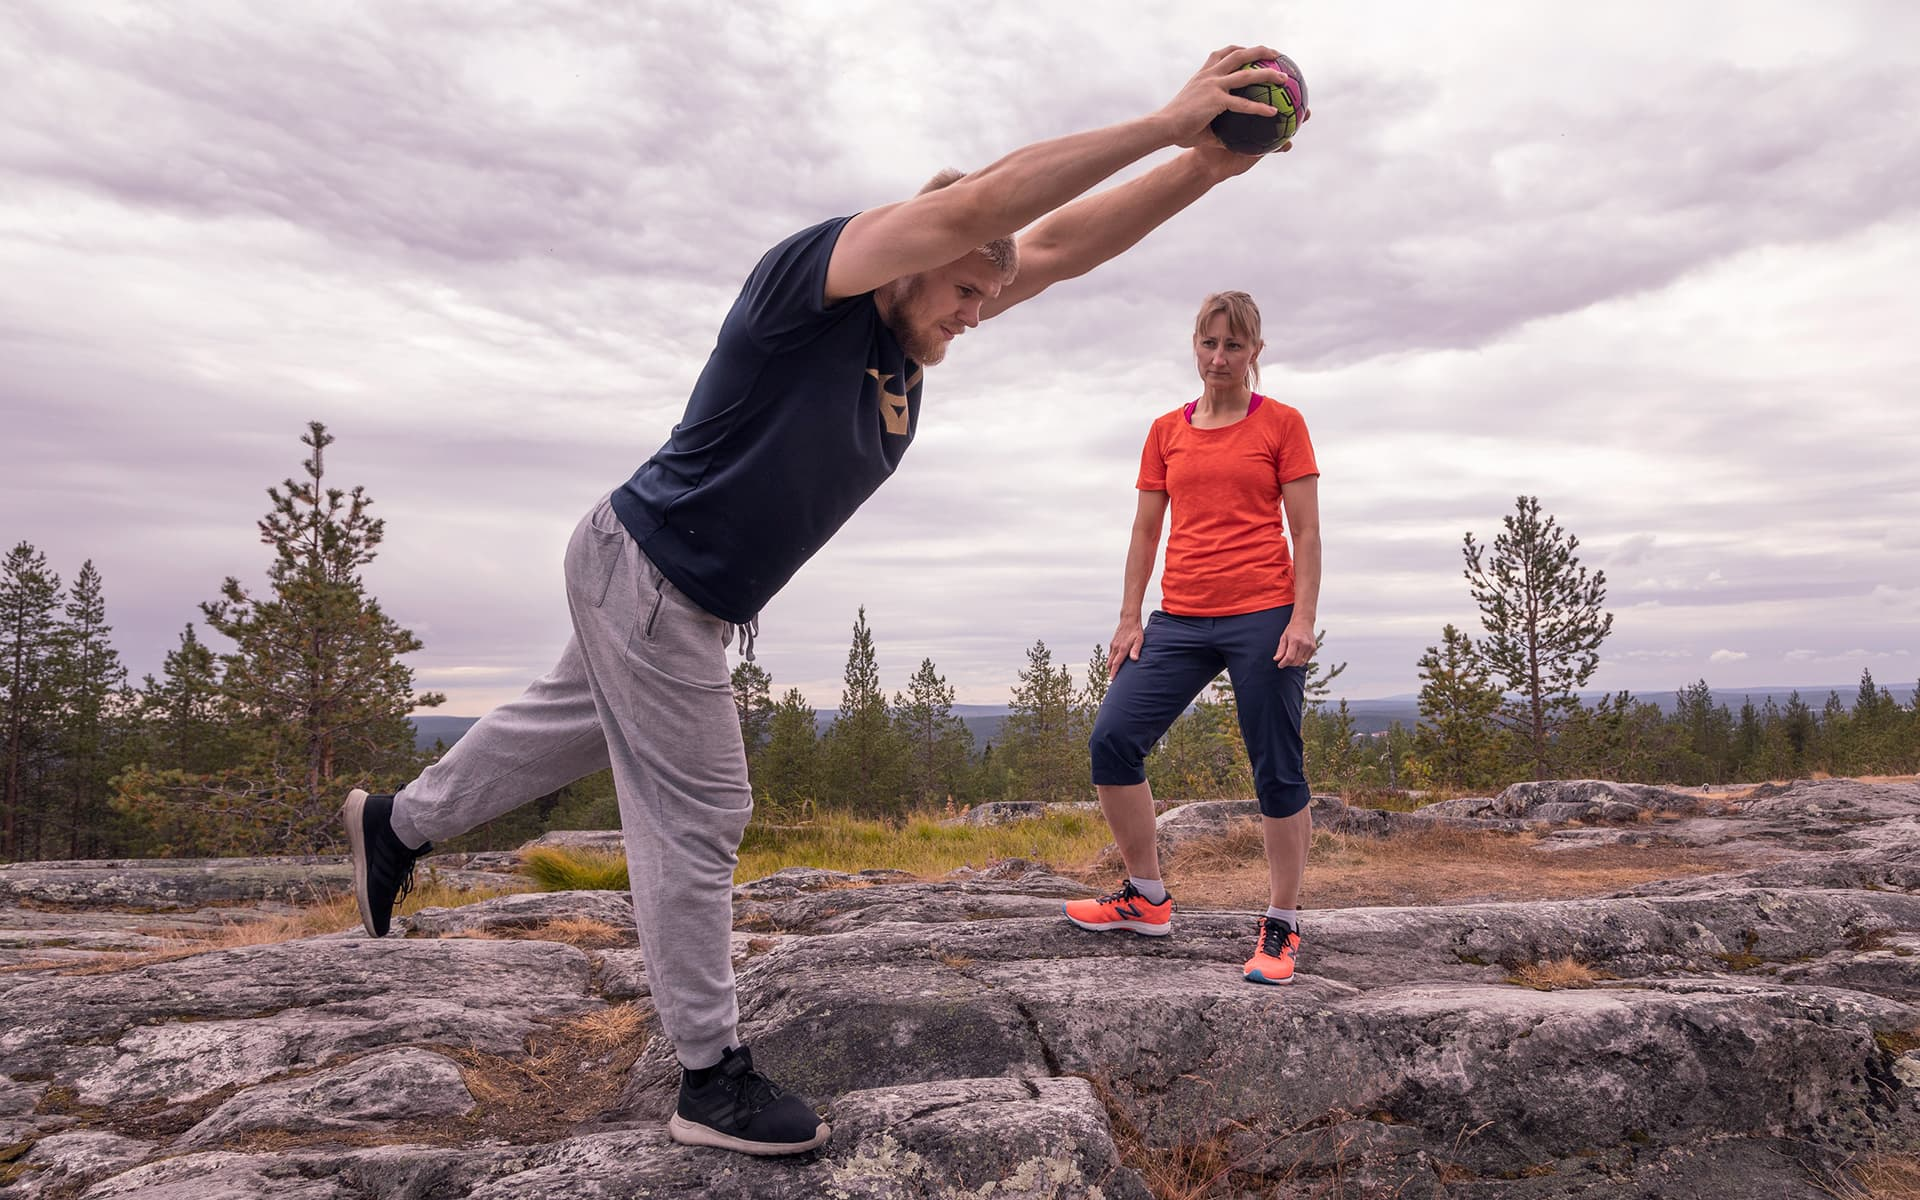 Tanja Poutiainen supervises the exercise in Ounasvaara